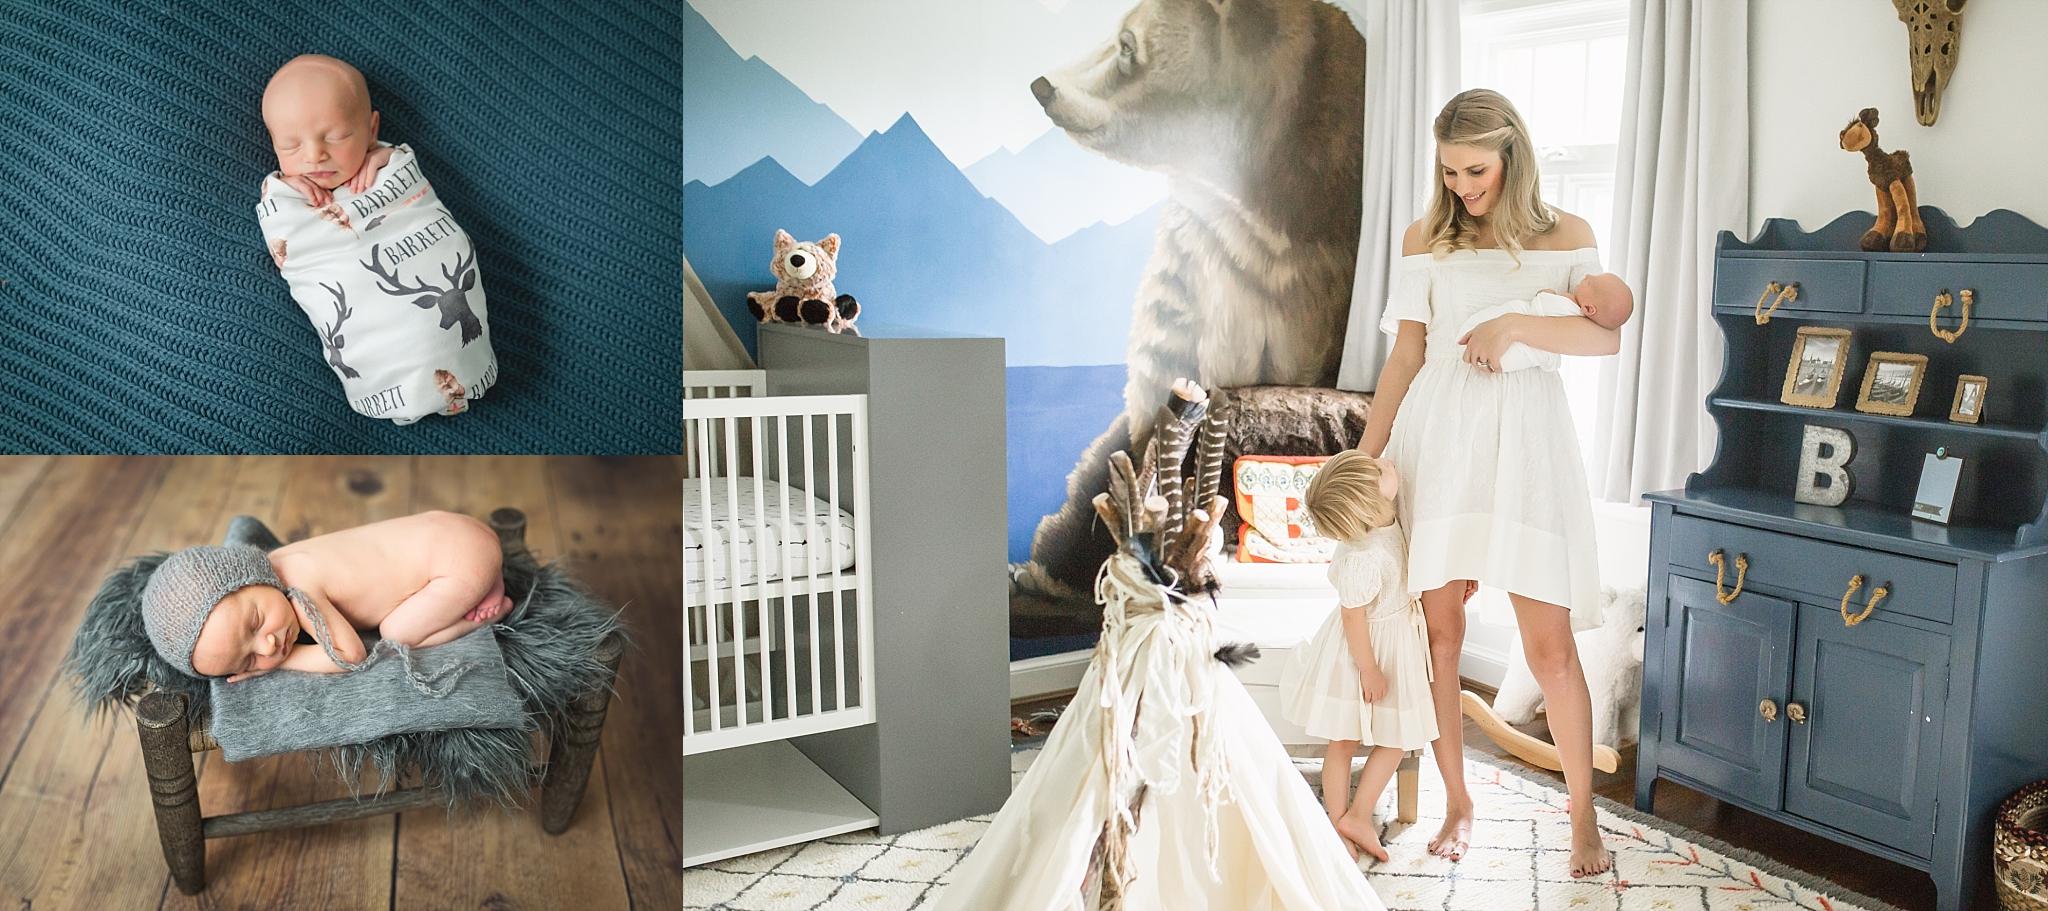 In-home Lifestyle Newborn Family Photo Session   Tonya Teran Photography, Washington, DC Newborn, Baby, and Family Photographer